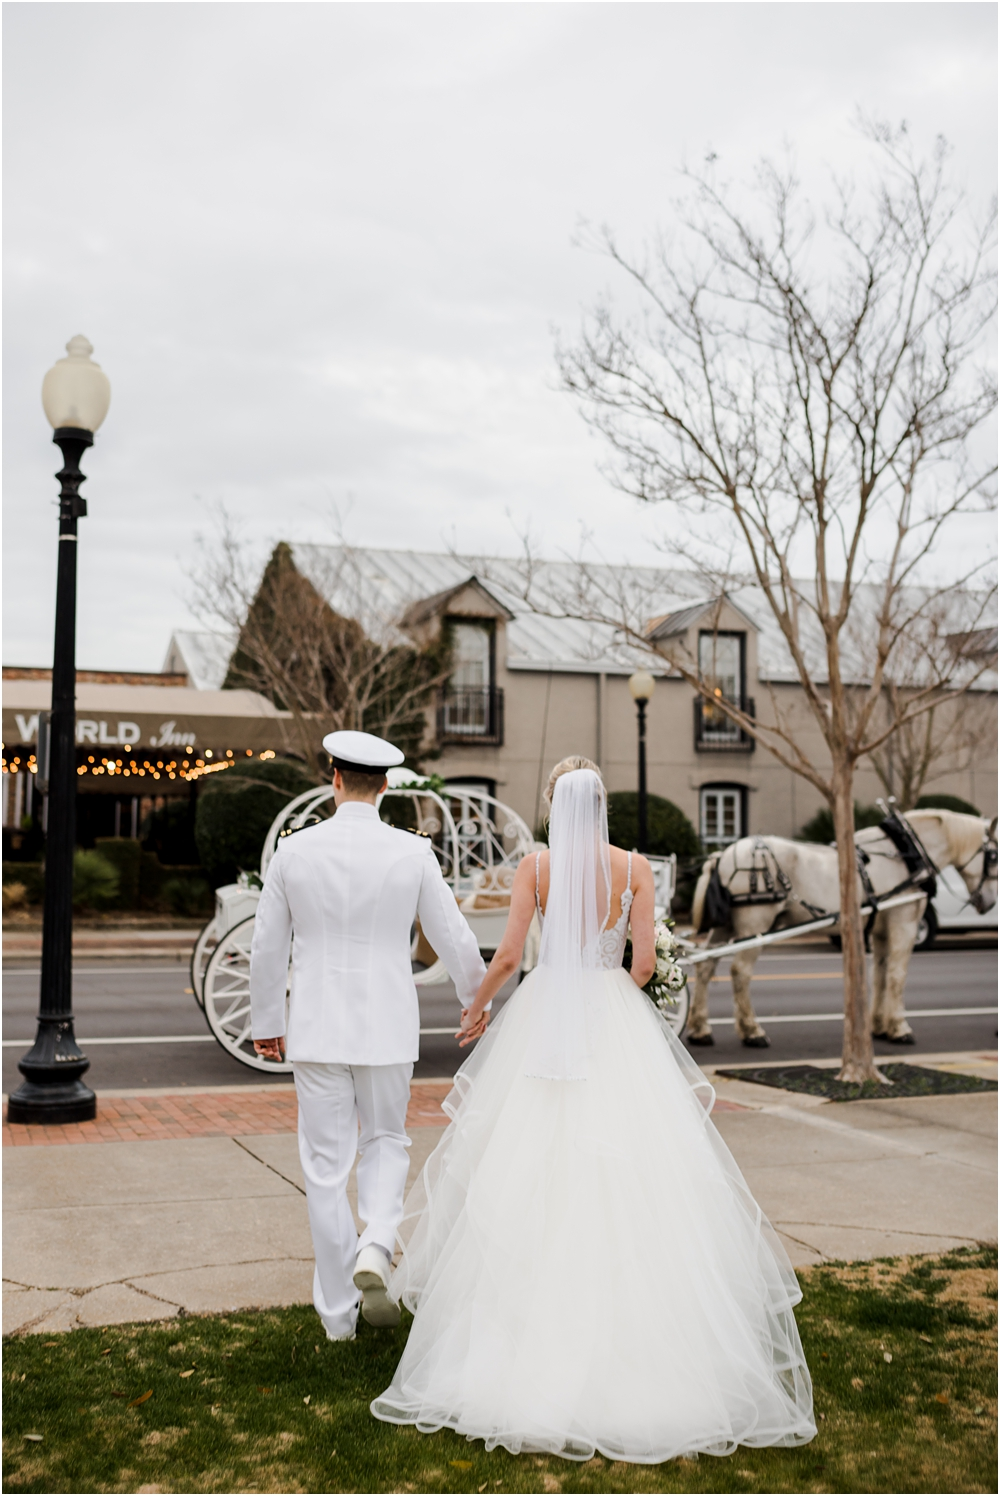 oconnor-pensacola-florida-wedding-photographer-kiersten-taylor-62.jpg